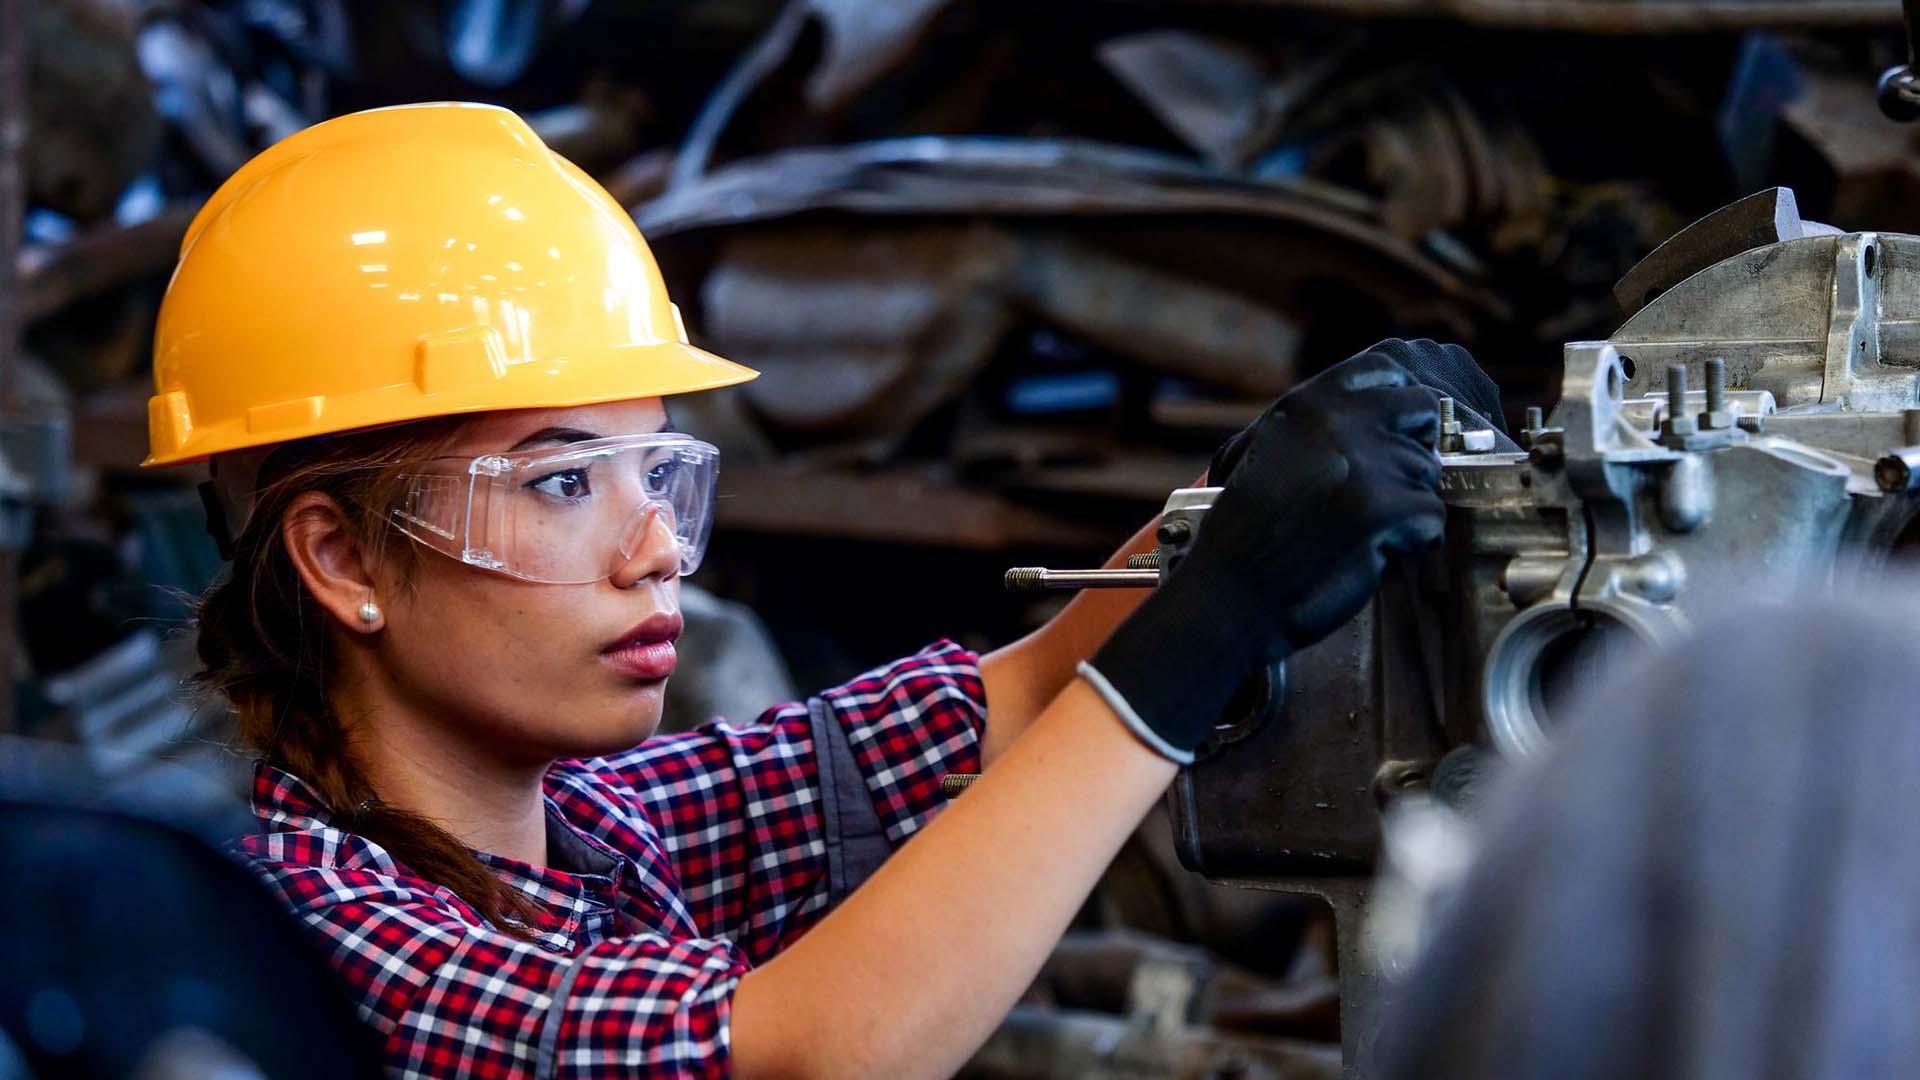 Female mechanic working on a vehicle